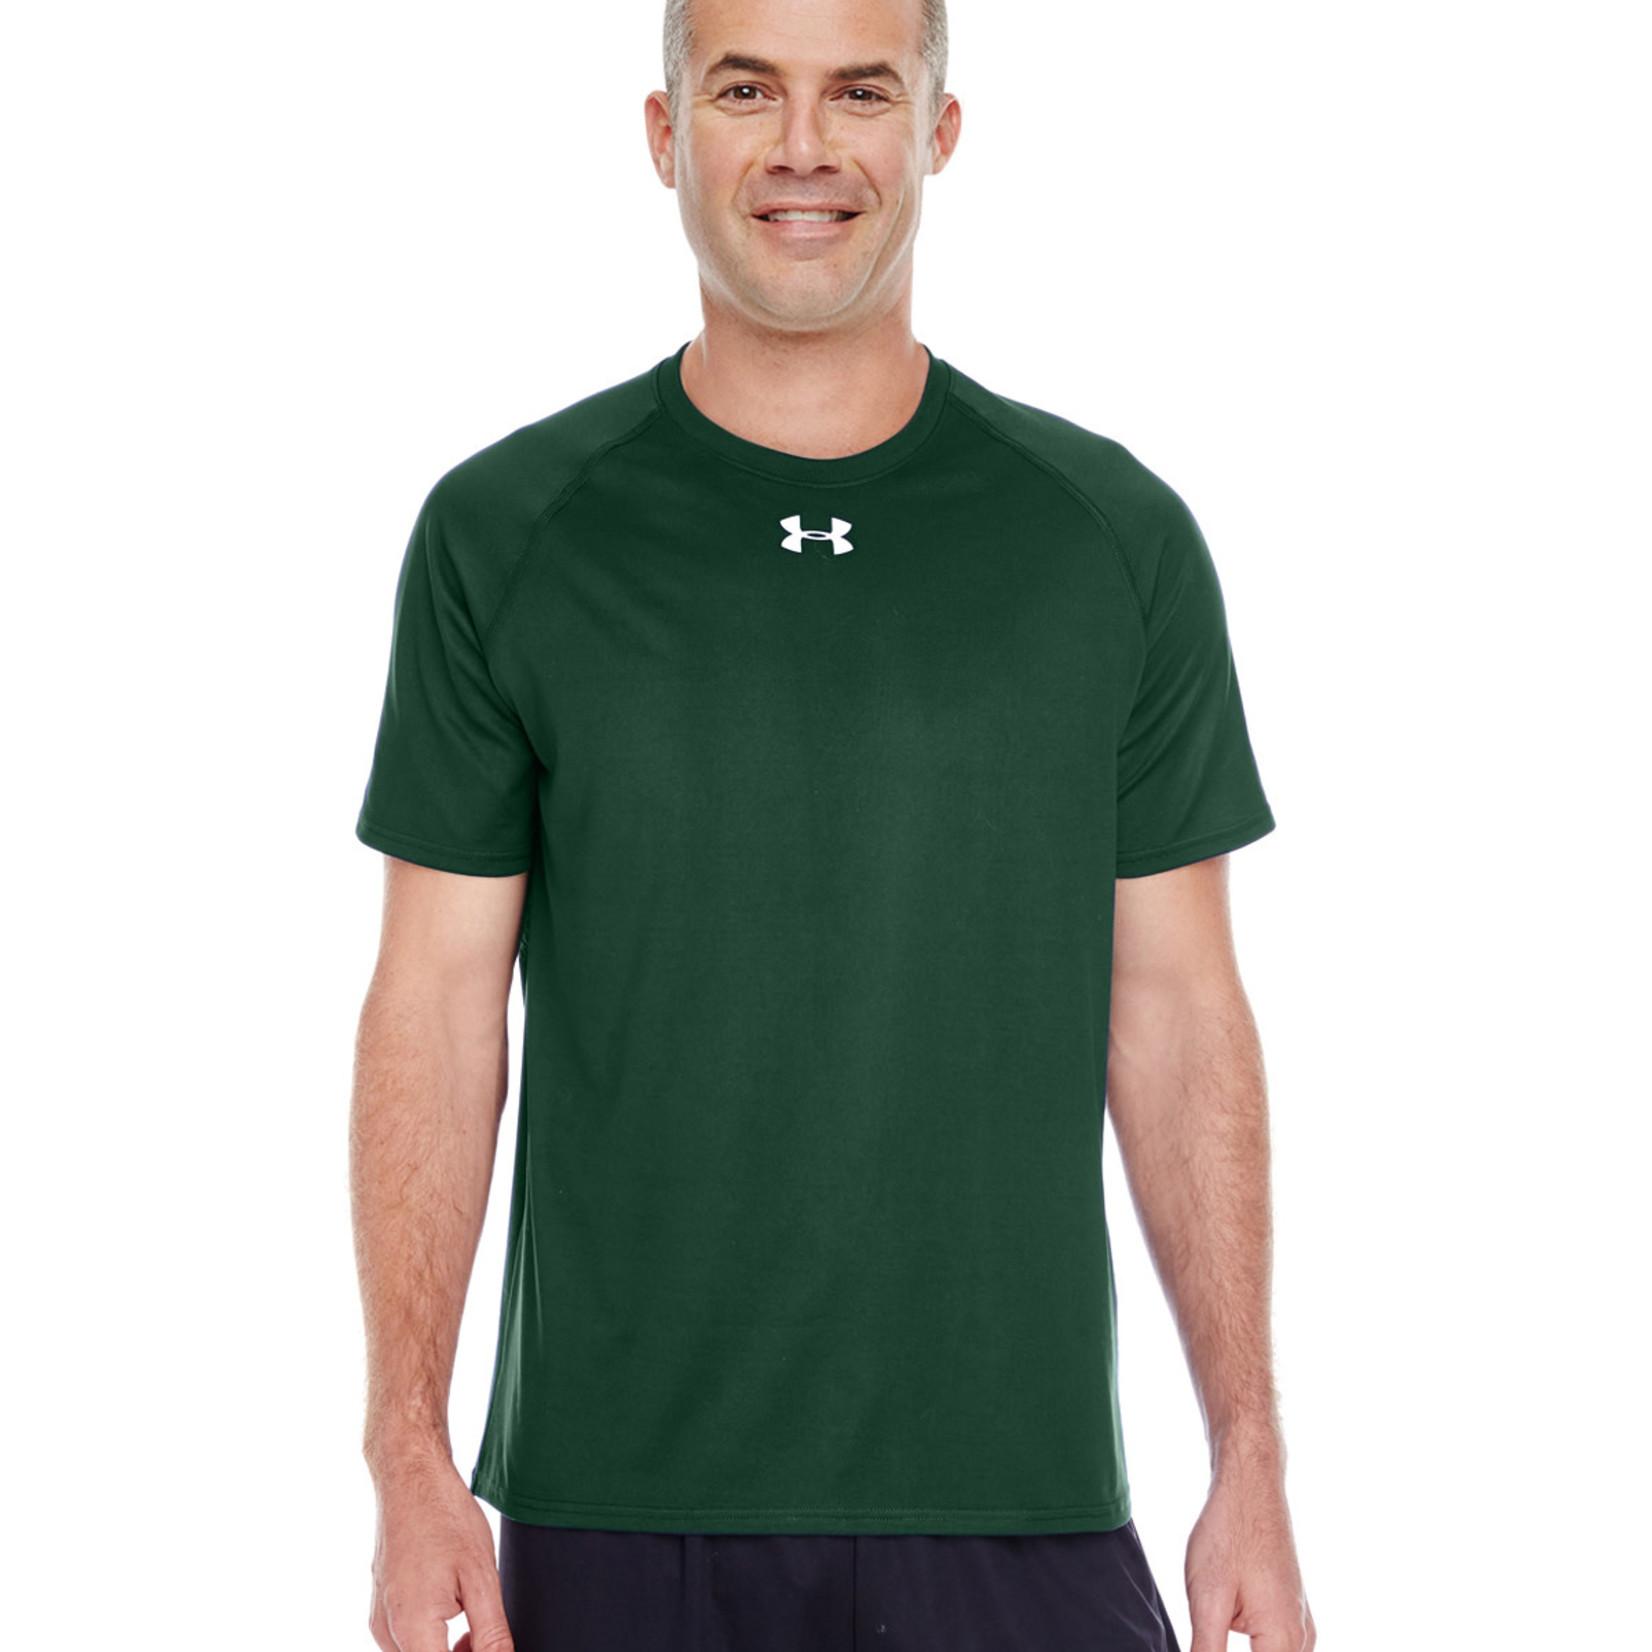 UA1268471 Men's Green Tee SMALL